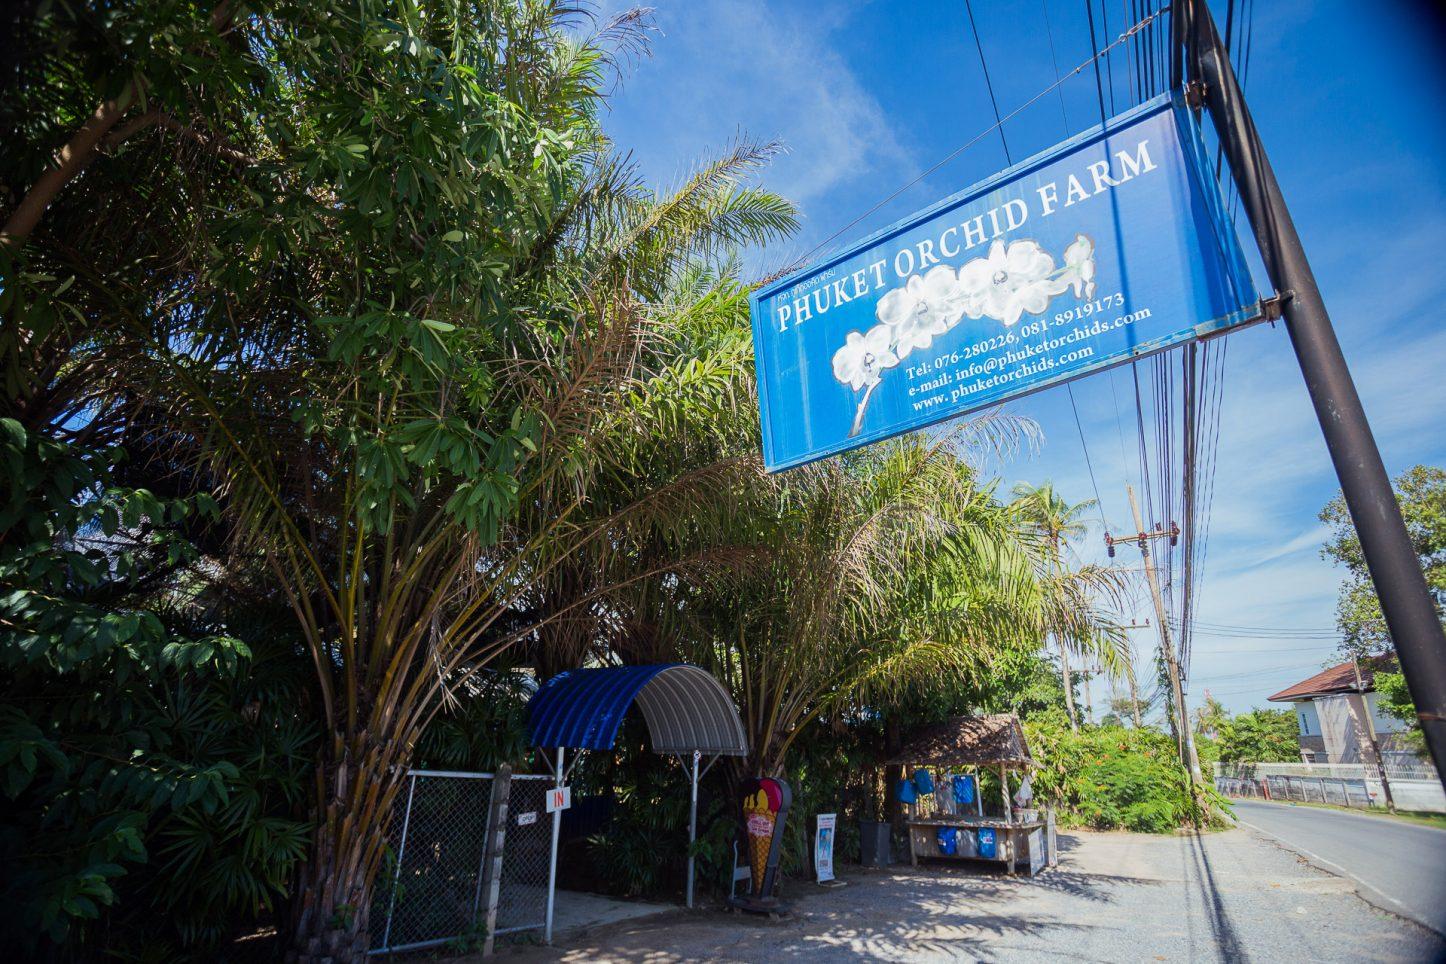 Phuket Orchid Farm | Attractions Near Kata Rocks Resort Phuket